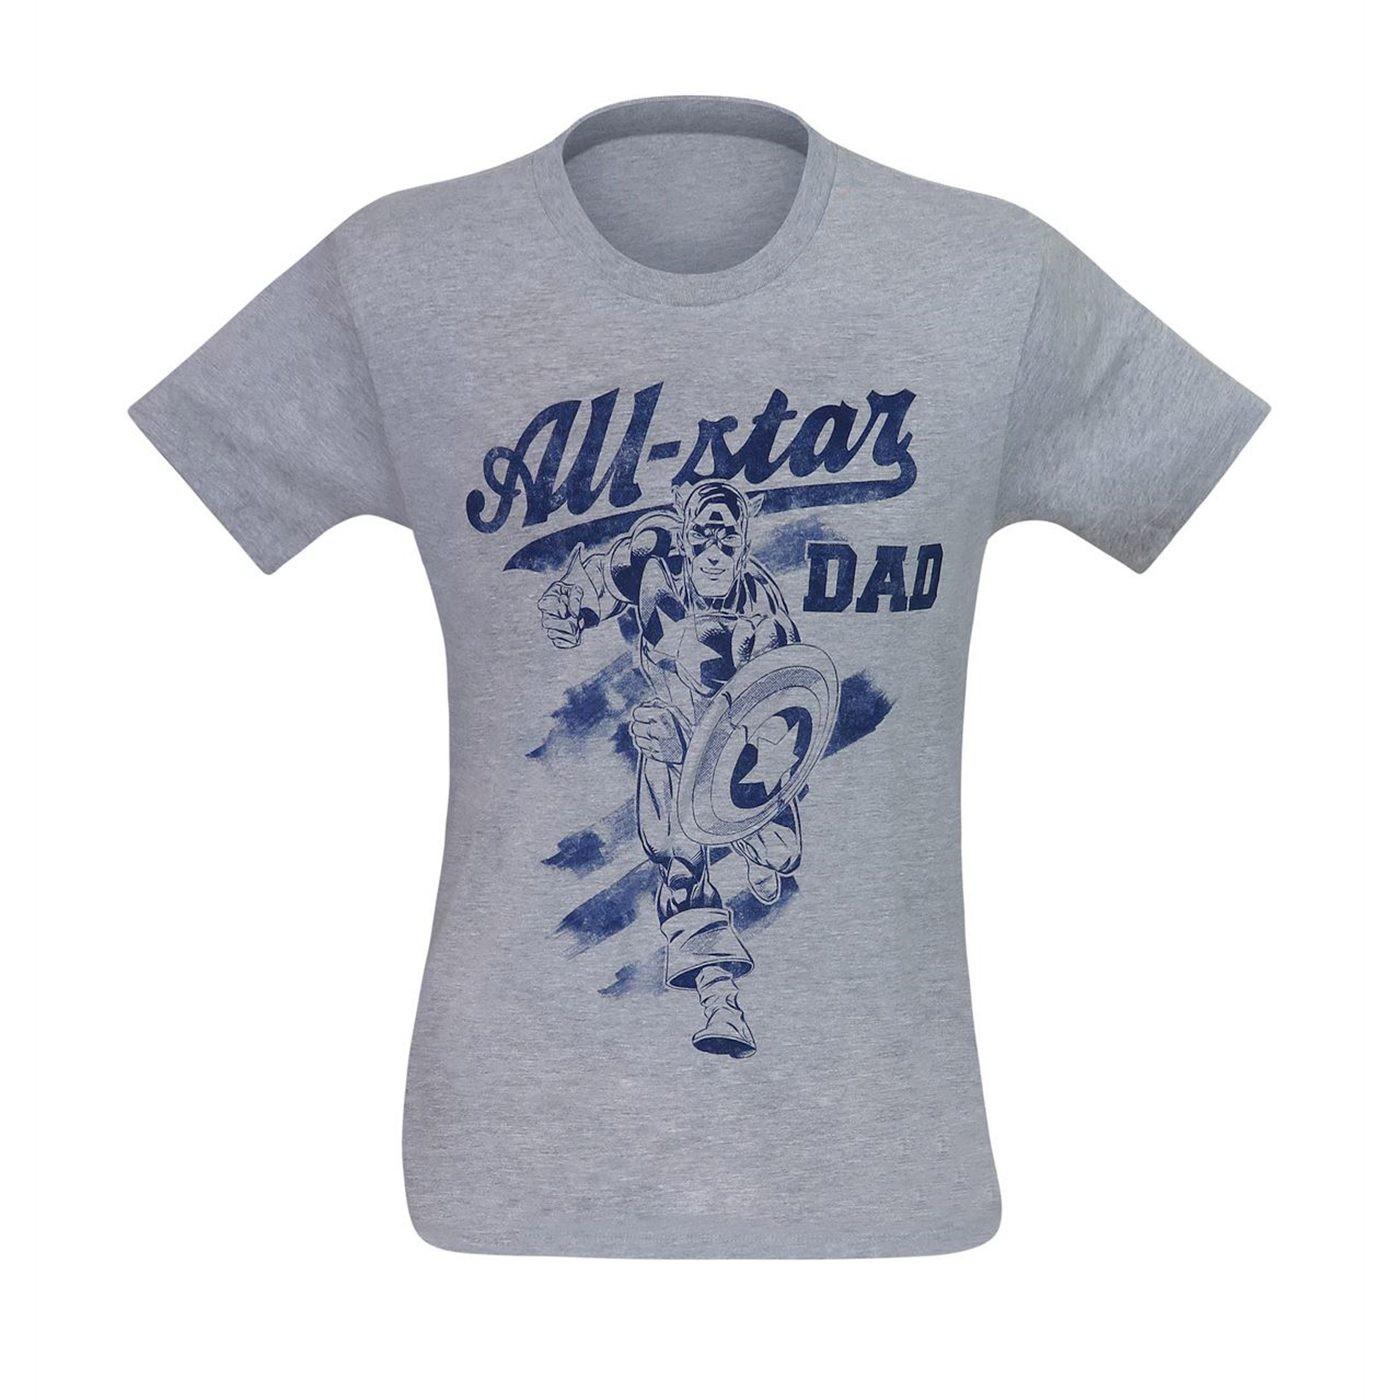 Captain America All-Star Dad Men's T-Shirt